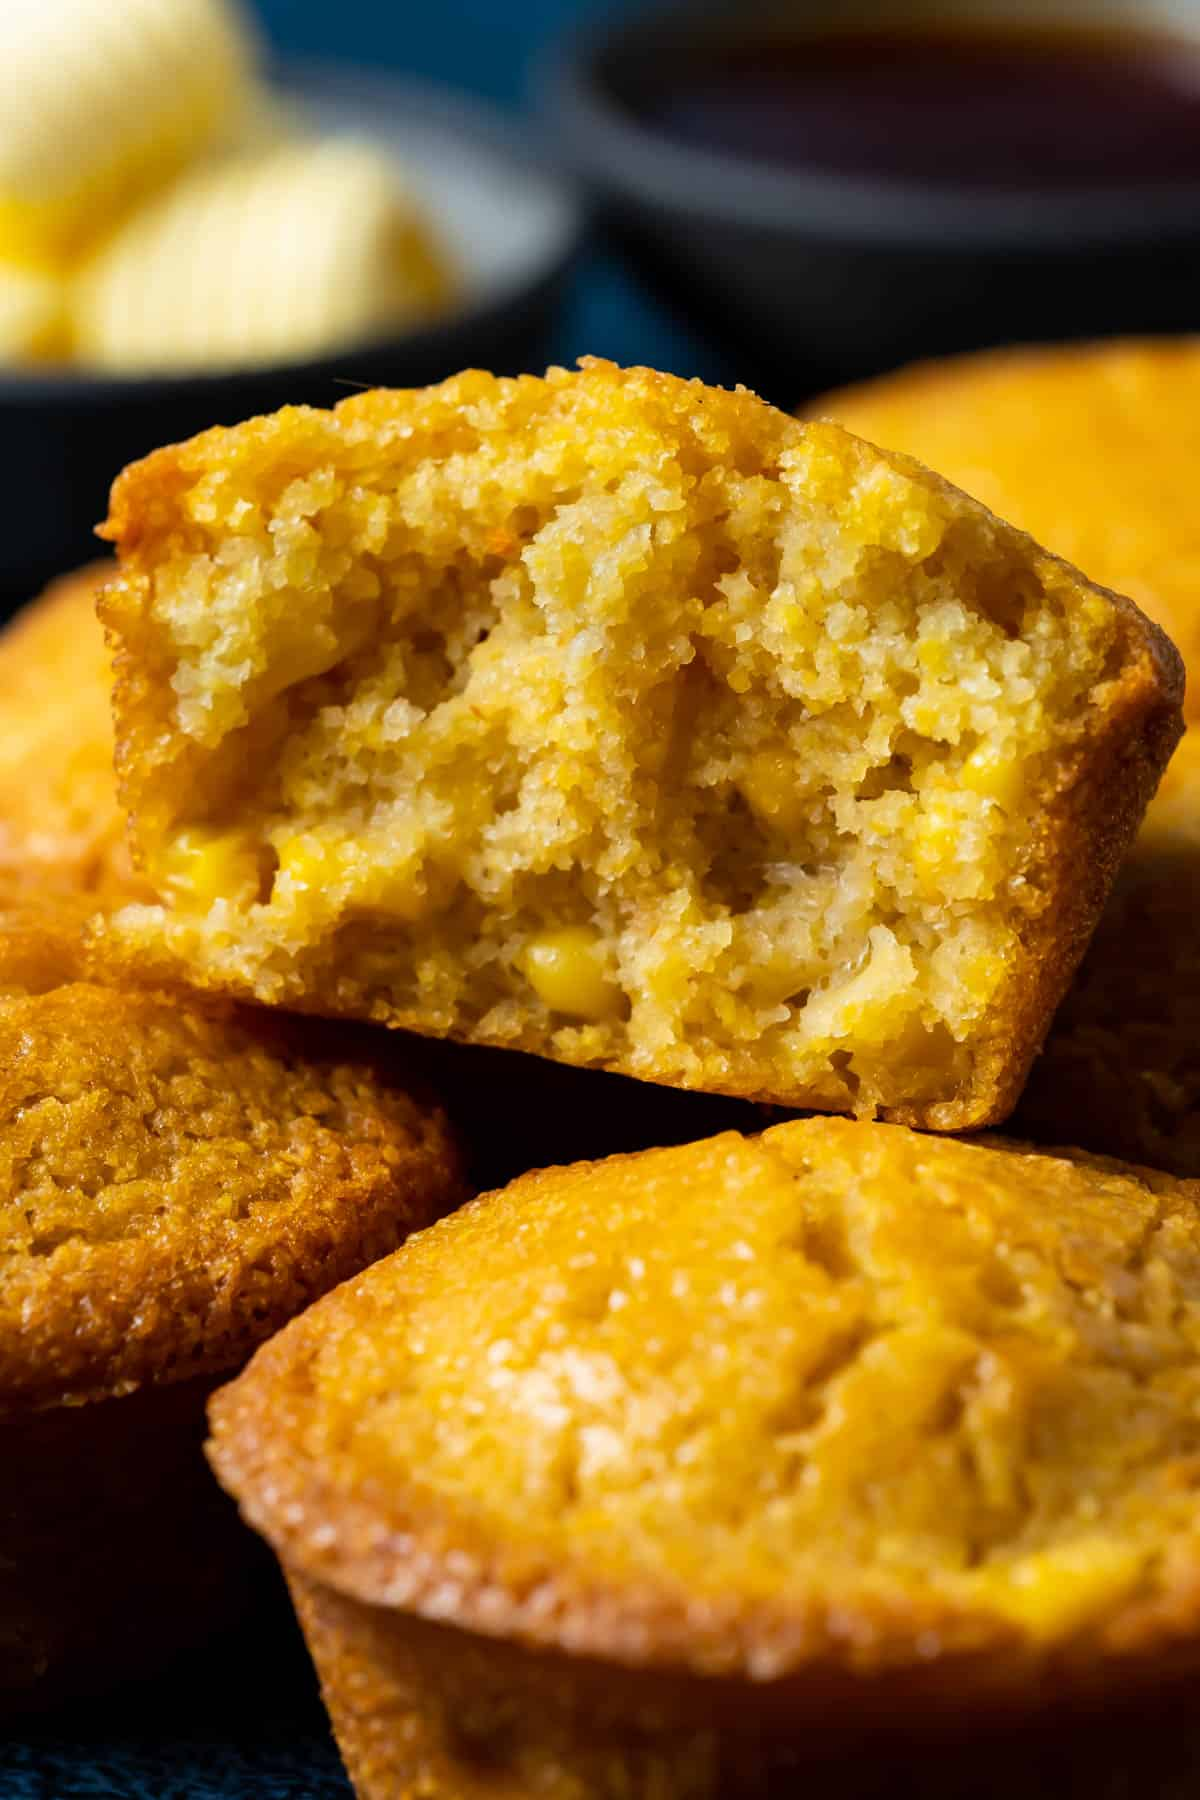 Vegan cornbread muffin broken in half.